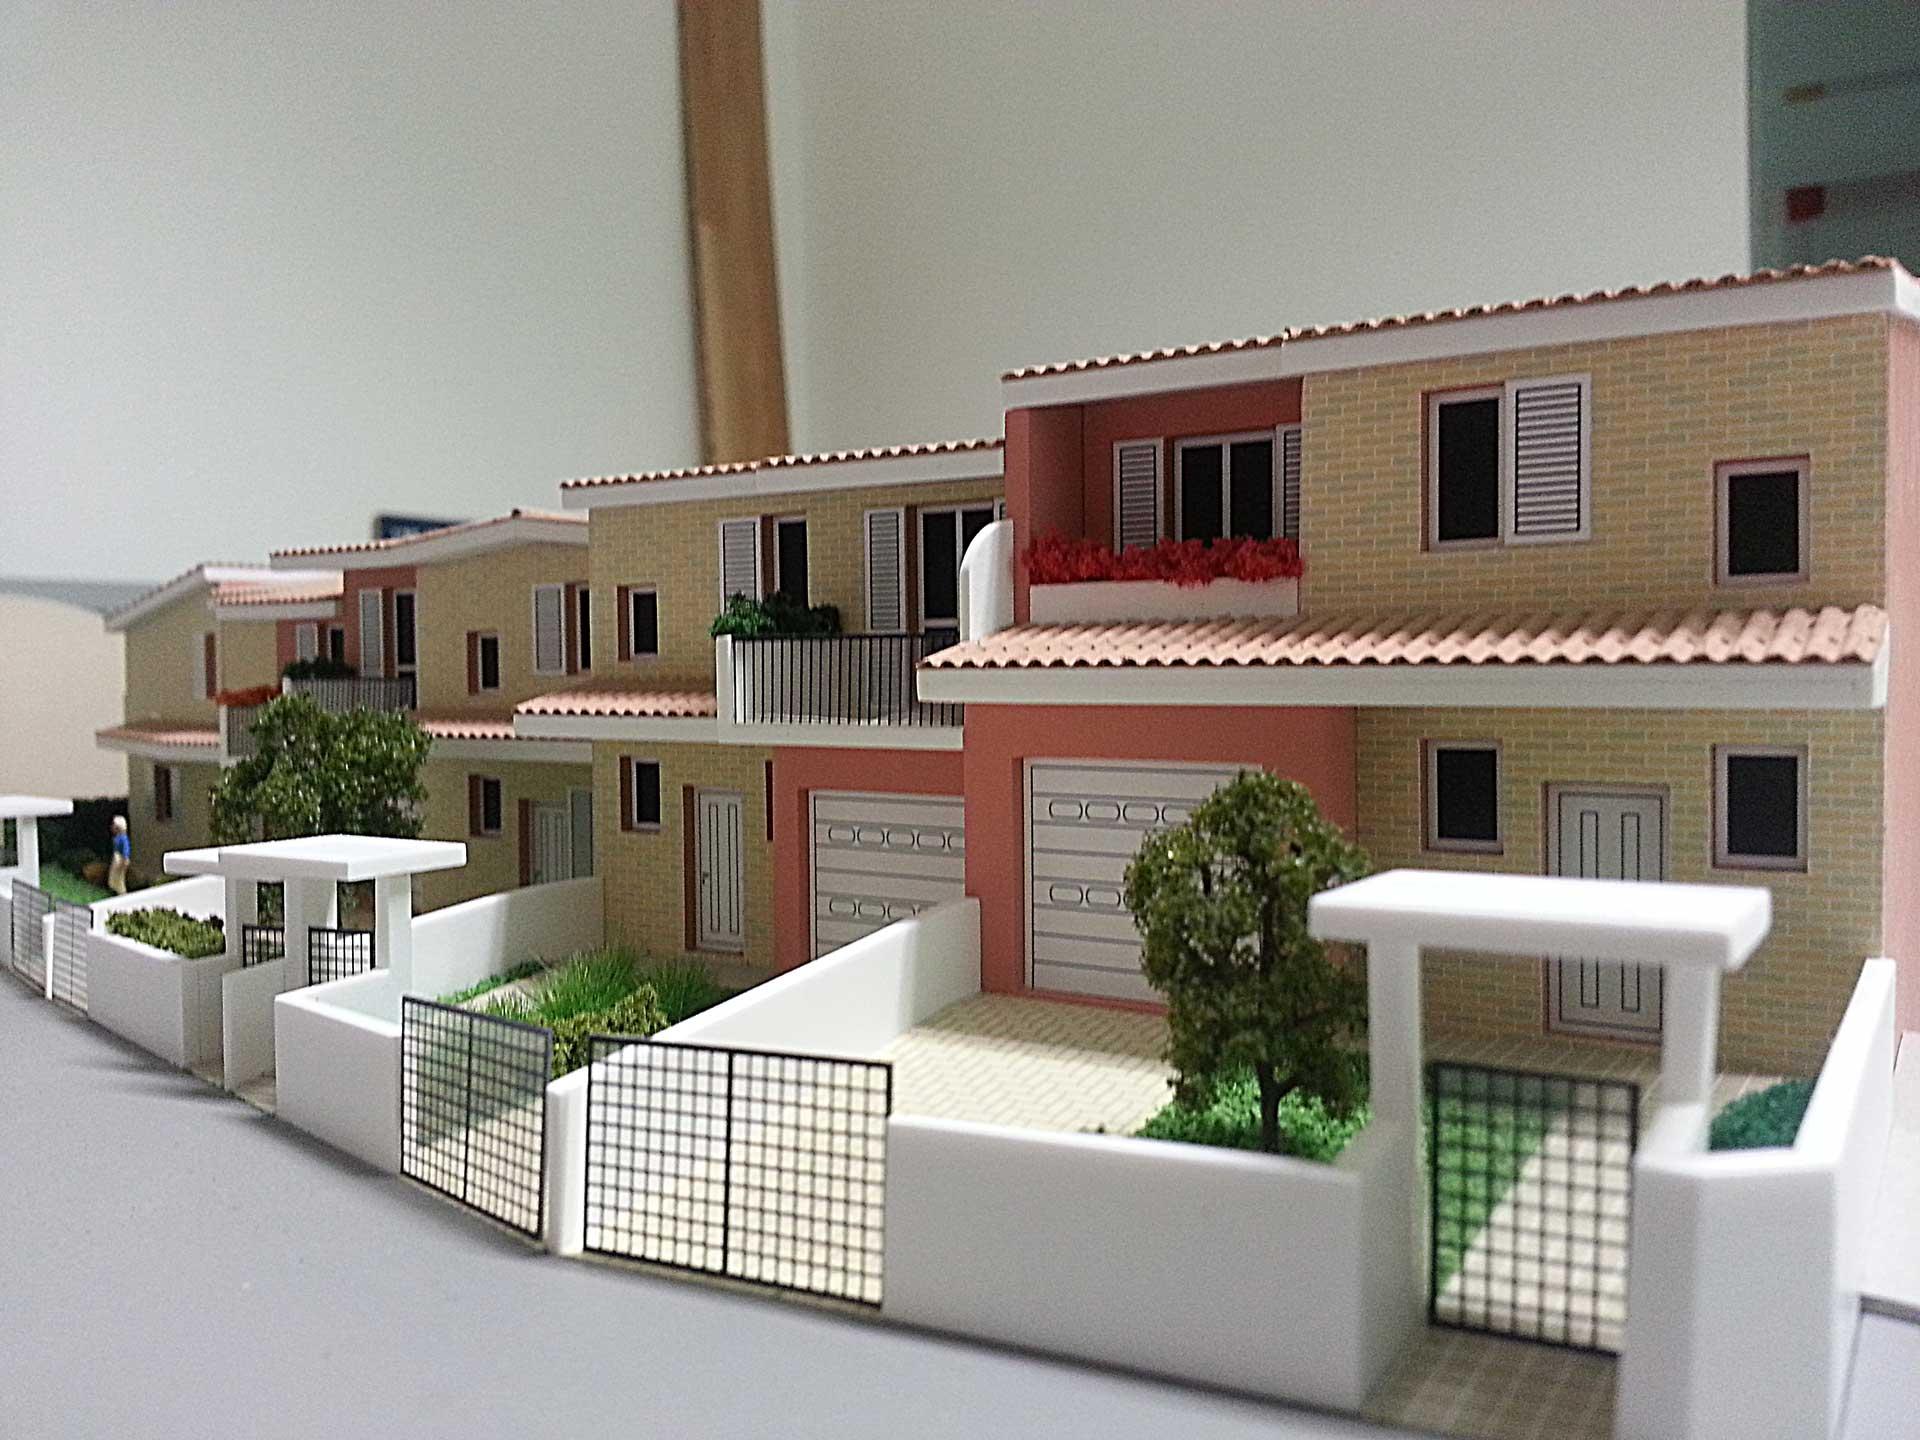 Impresa Edile Sallese Costruzioni Vasto (Chieti)